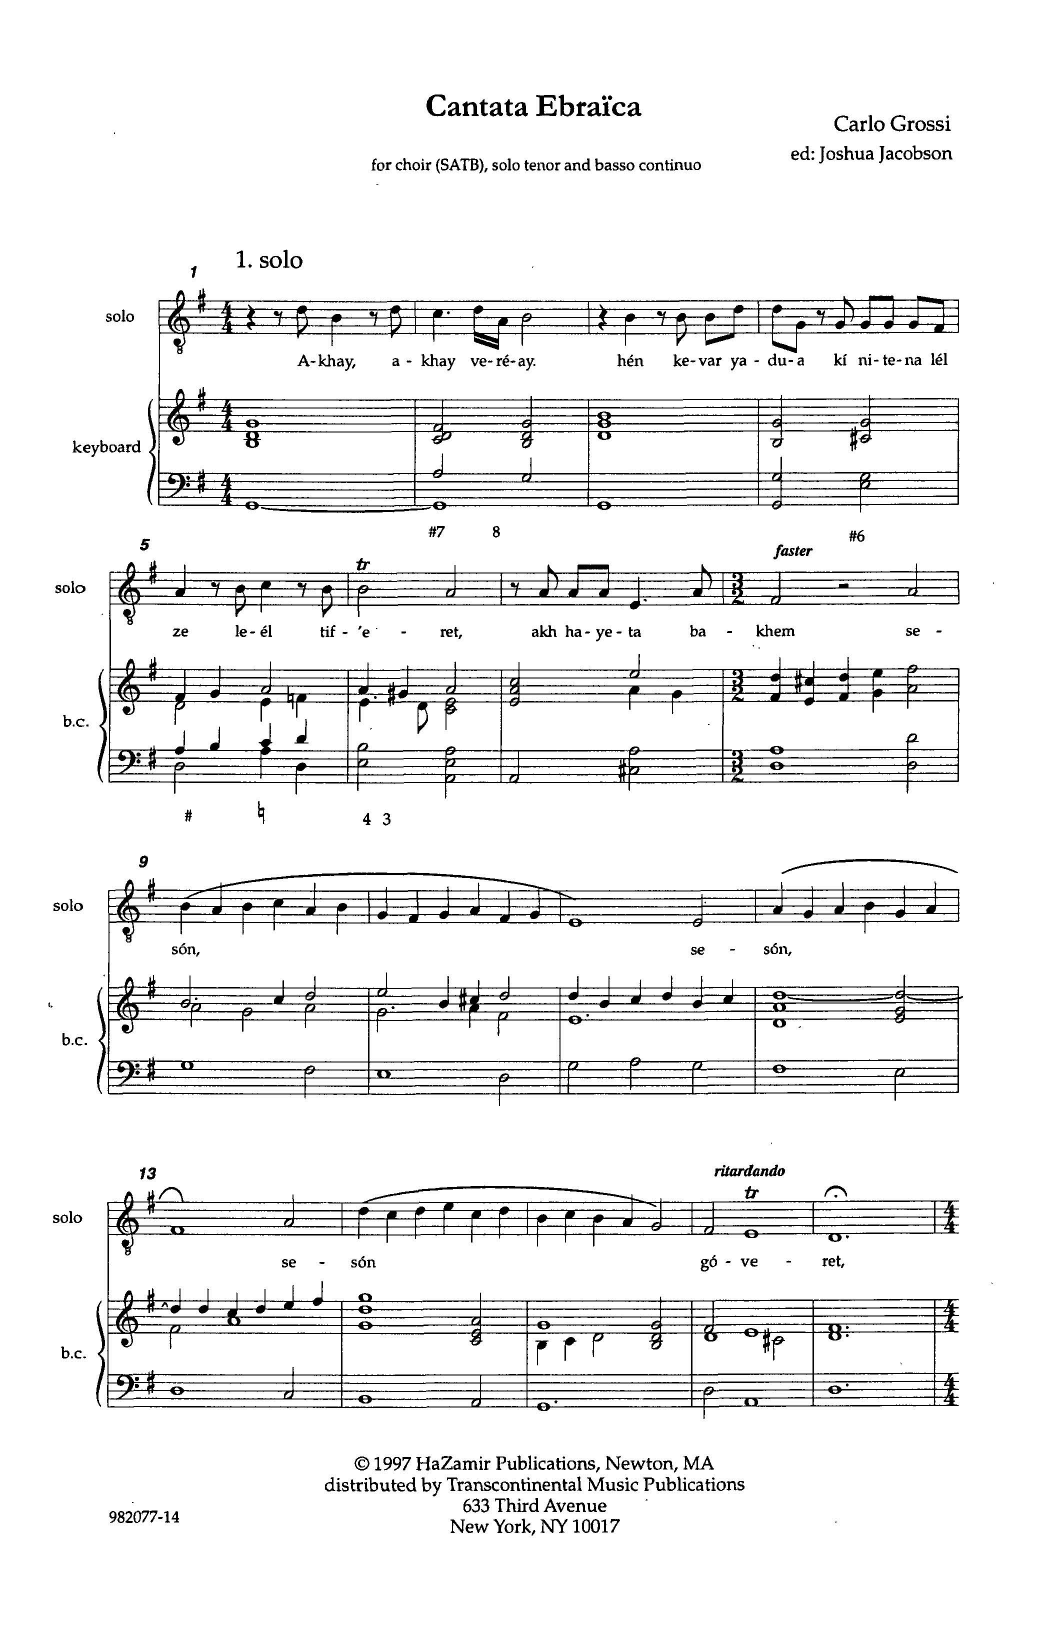 Cantata Ebraica